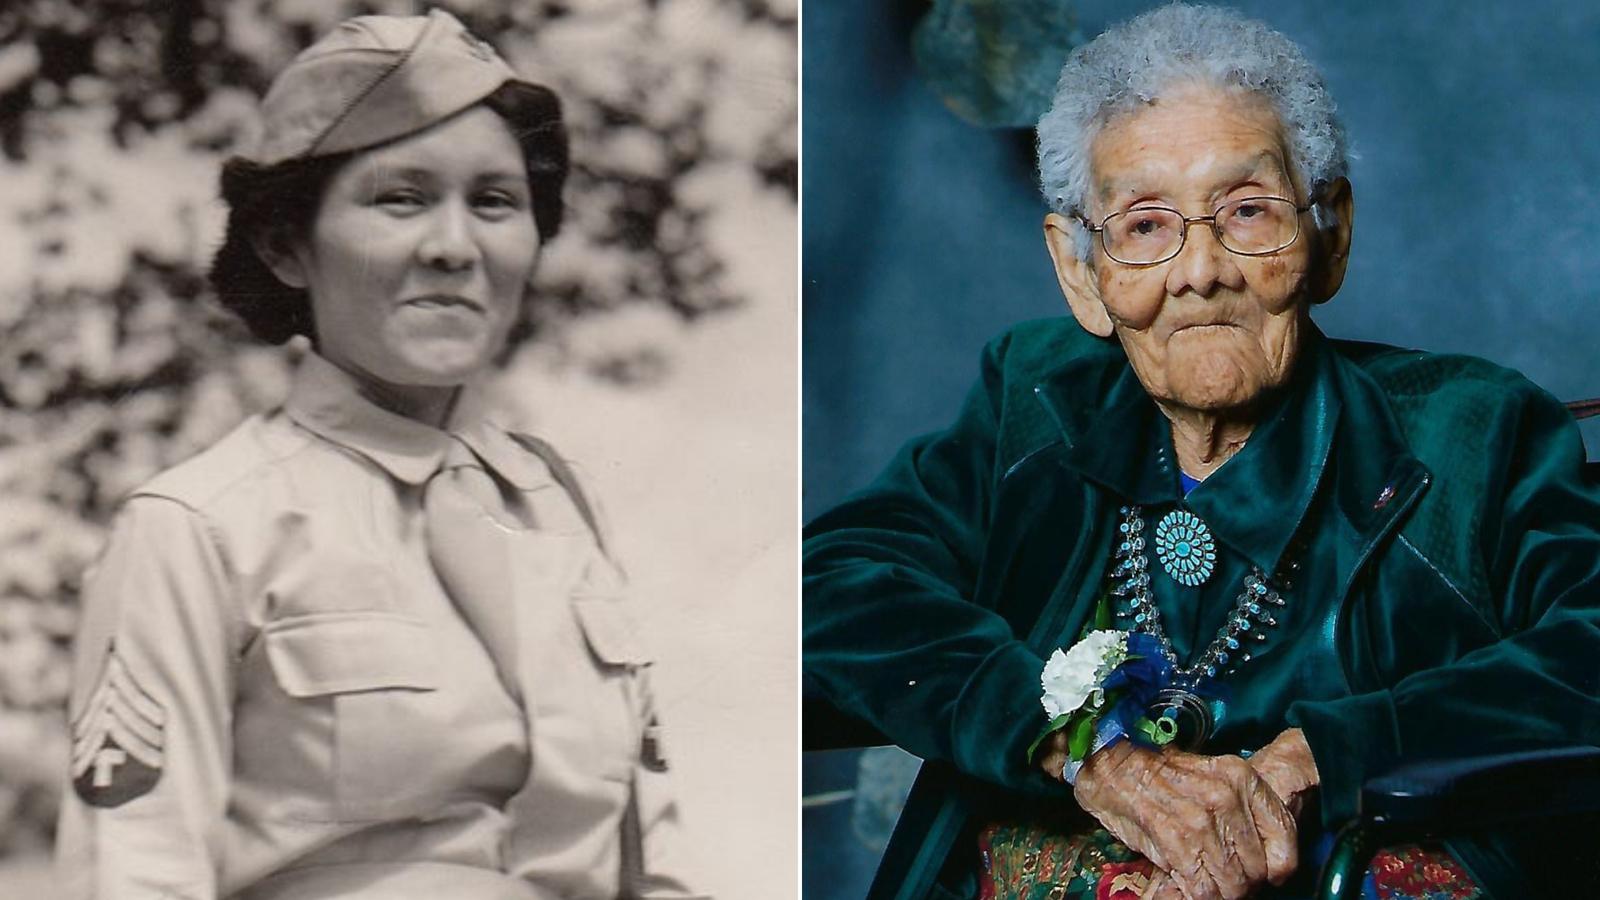 Sophie Yazzie, a WWII veteran and member of the Navajo Nation, dies at 105